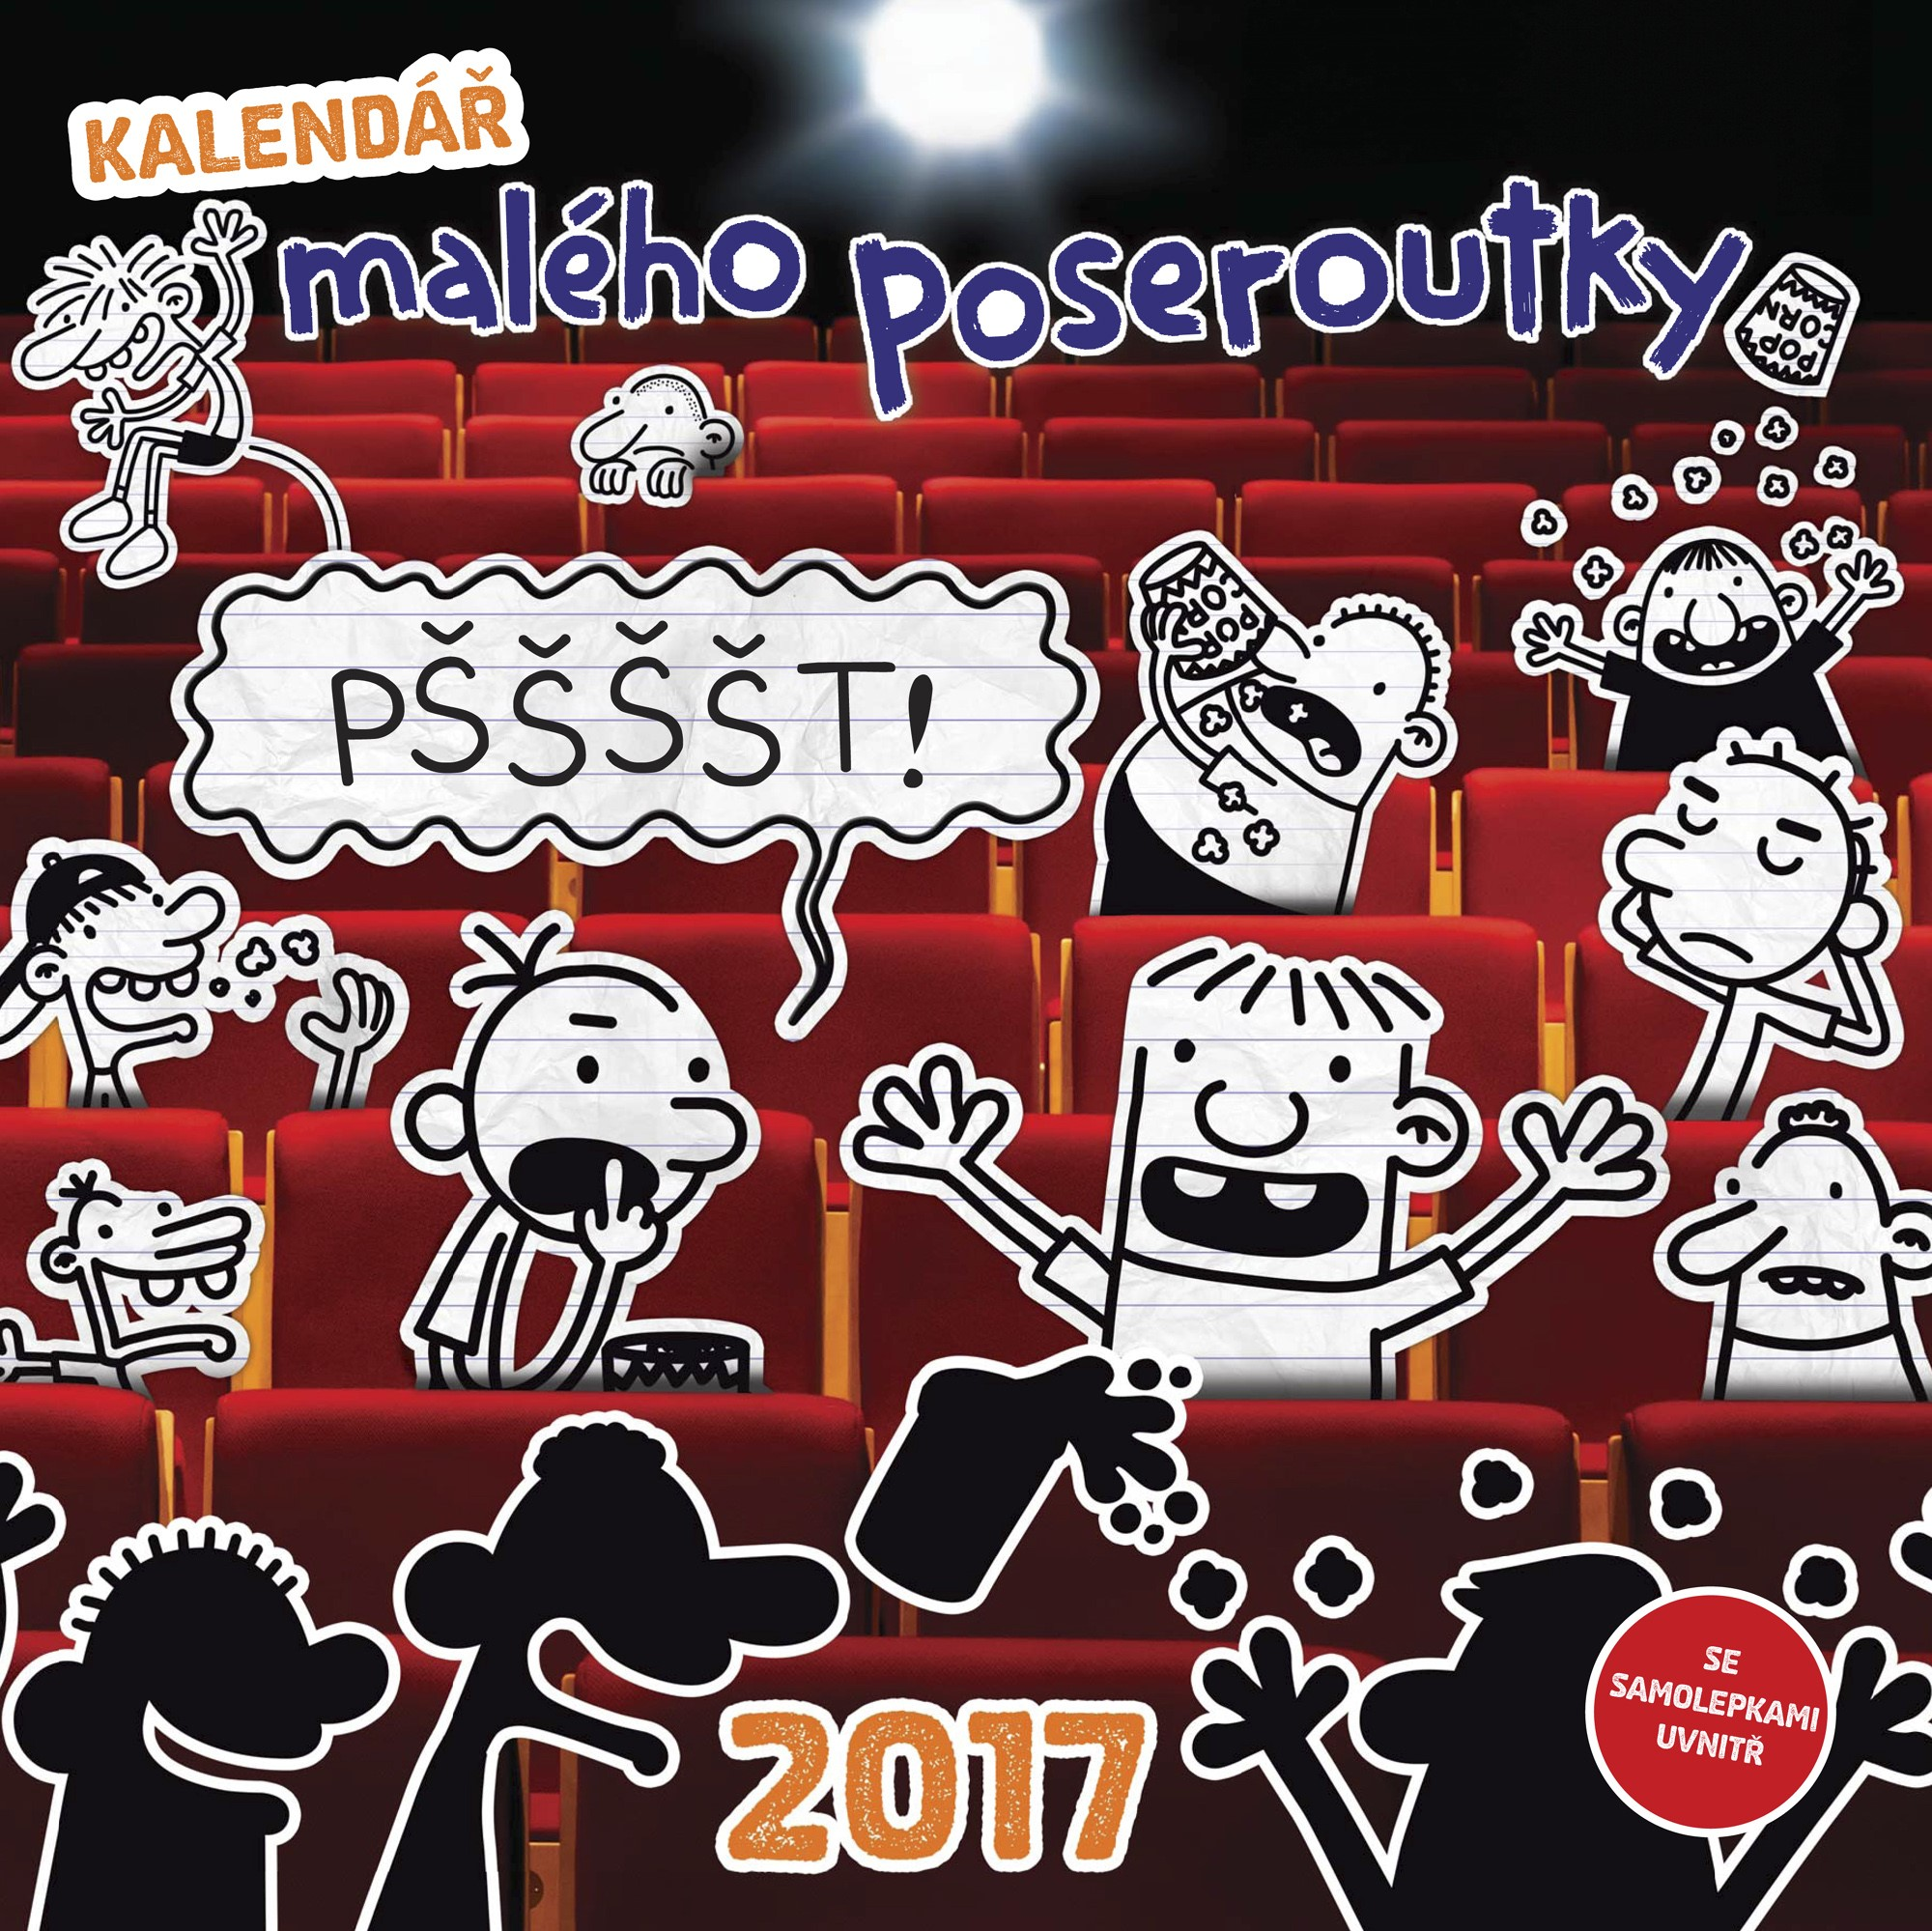 Kalendář malého poseroutky 2017